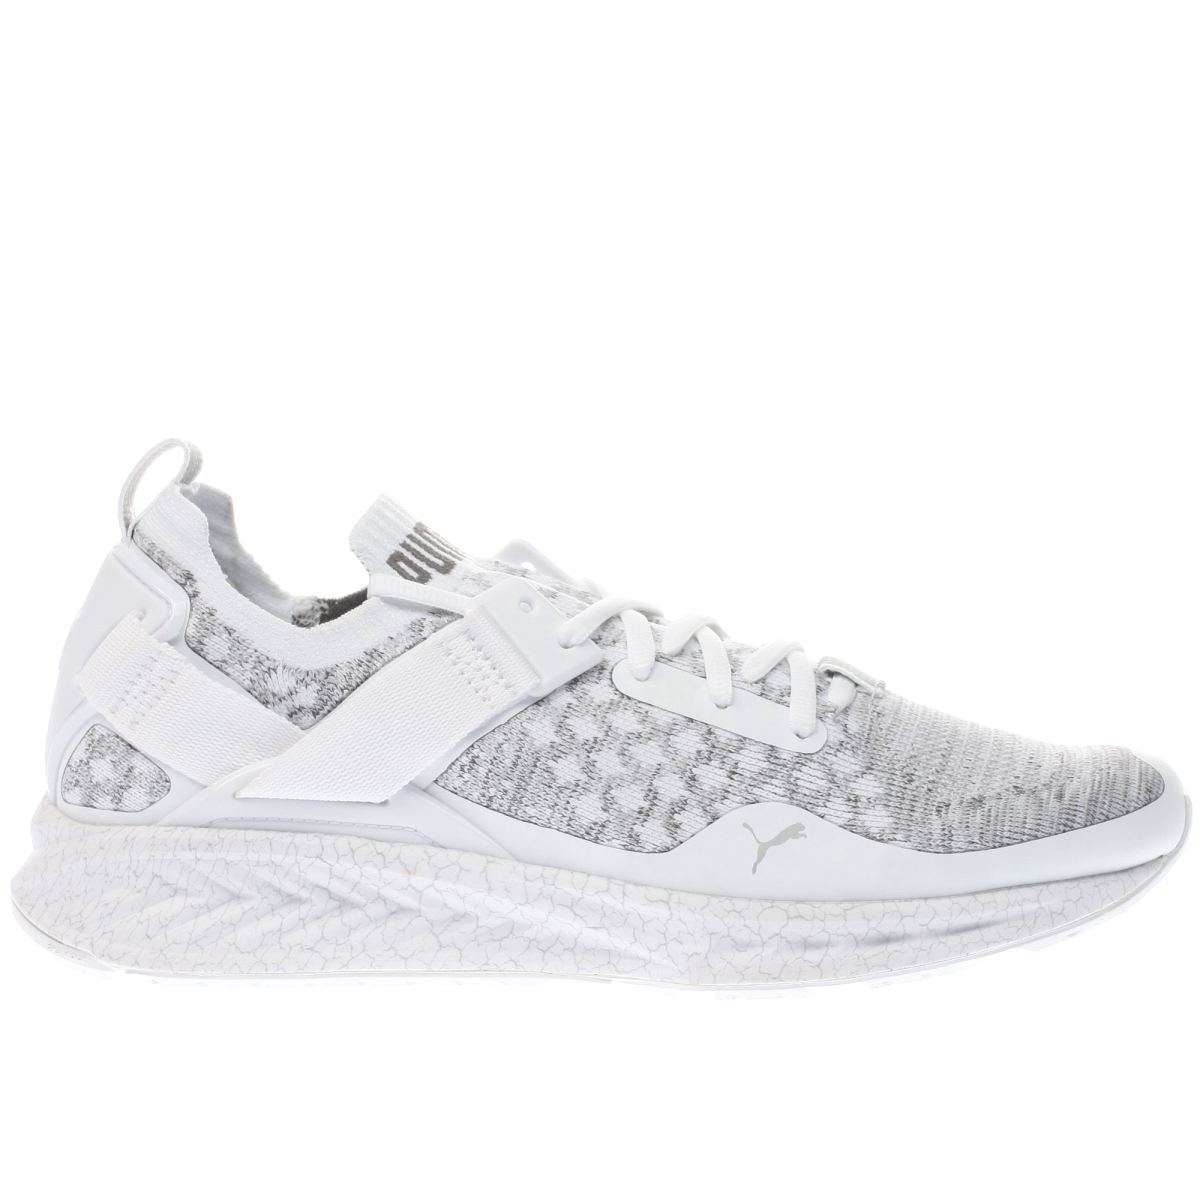 puma white & grey ignite limitless evoknit trainers